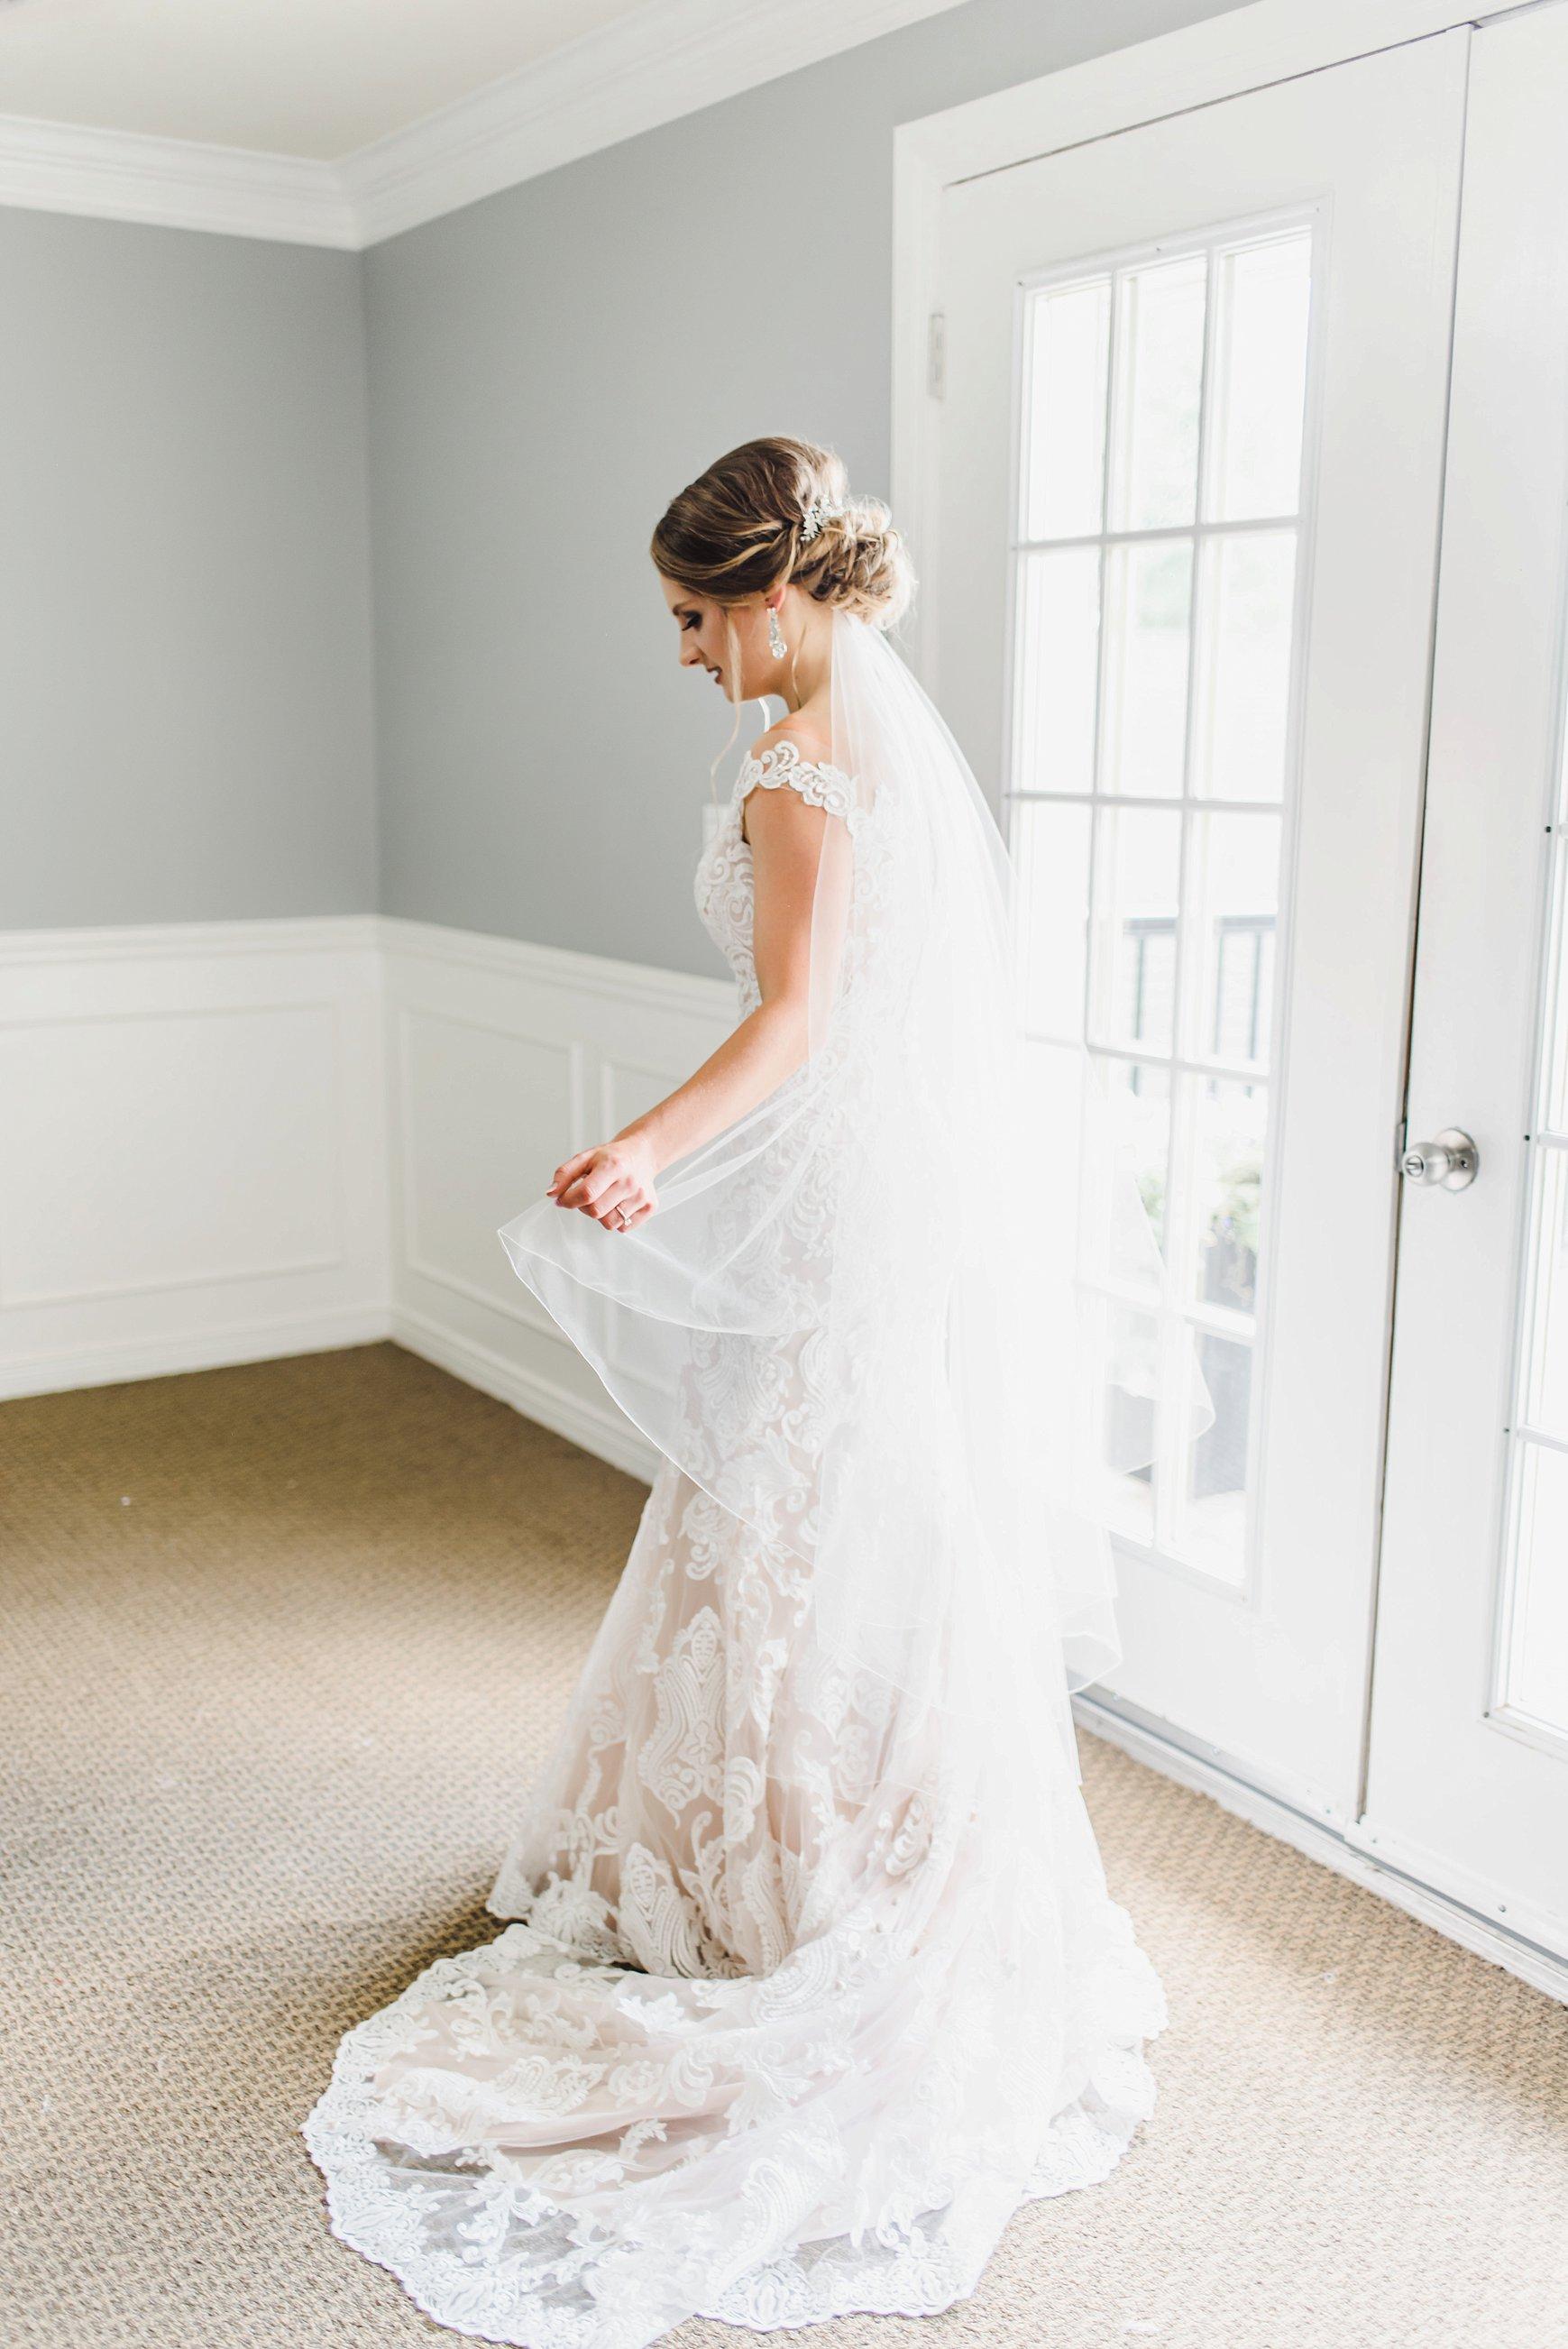 light airy indie fine art ottawa wedding photographer | Ali and Batoul Photography_1229.jpg